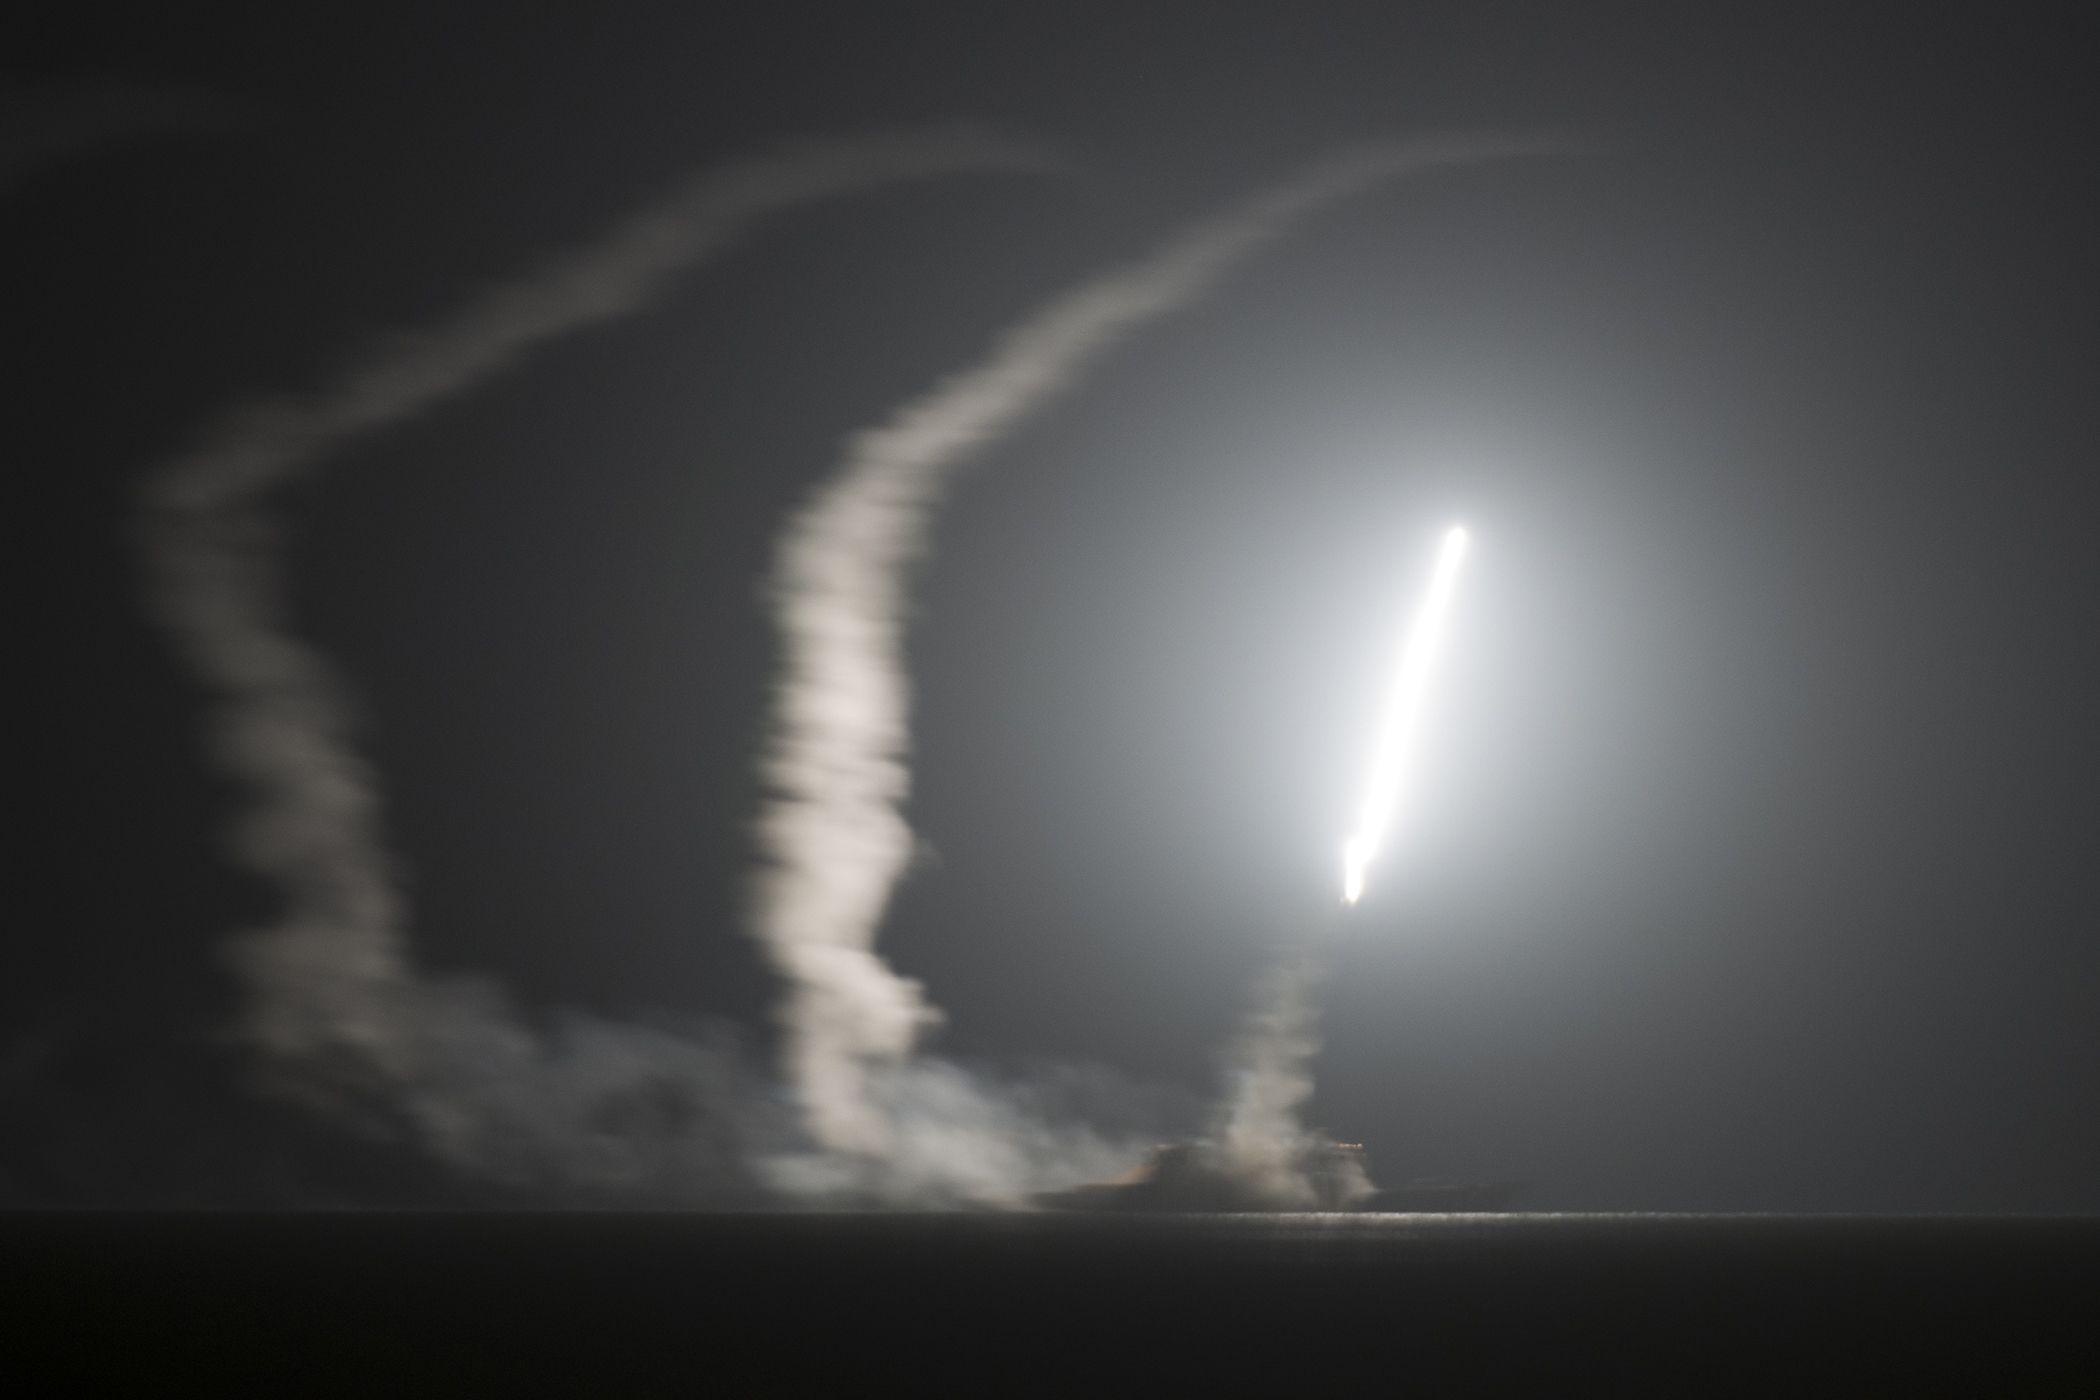 Tomahawk missile launch US Navy Arabian Gulf